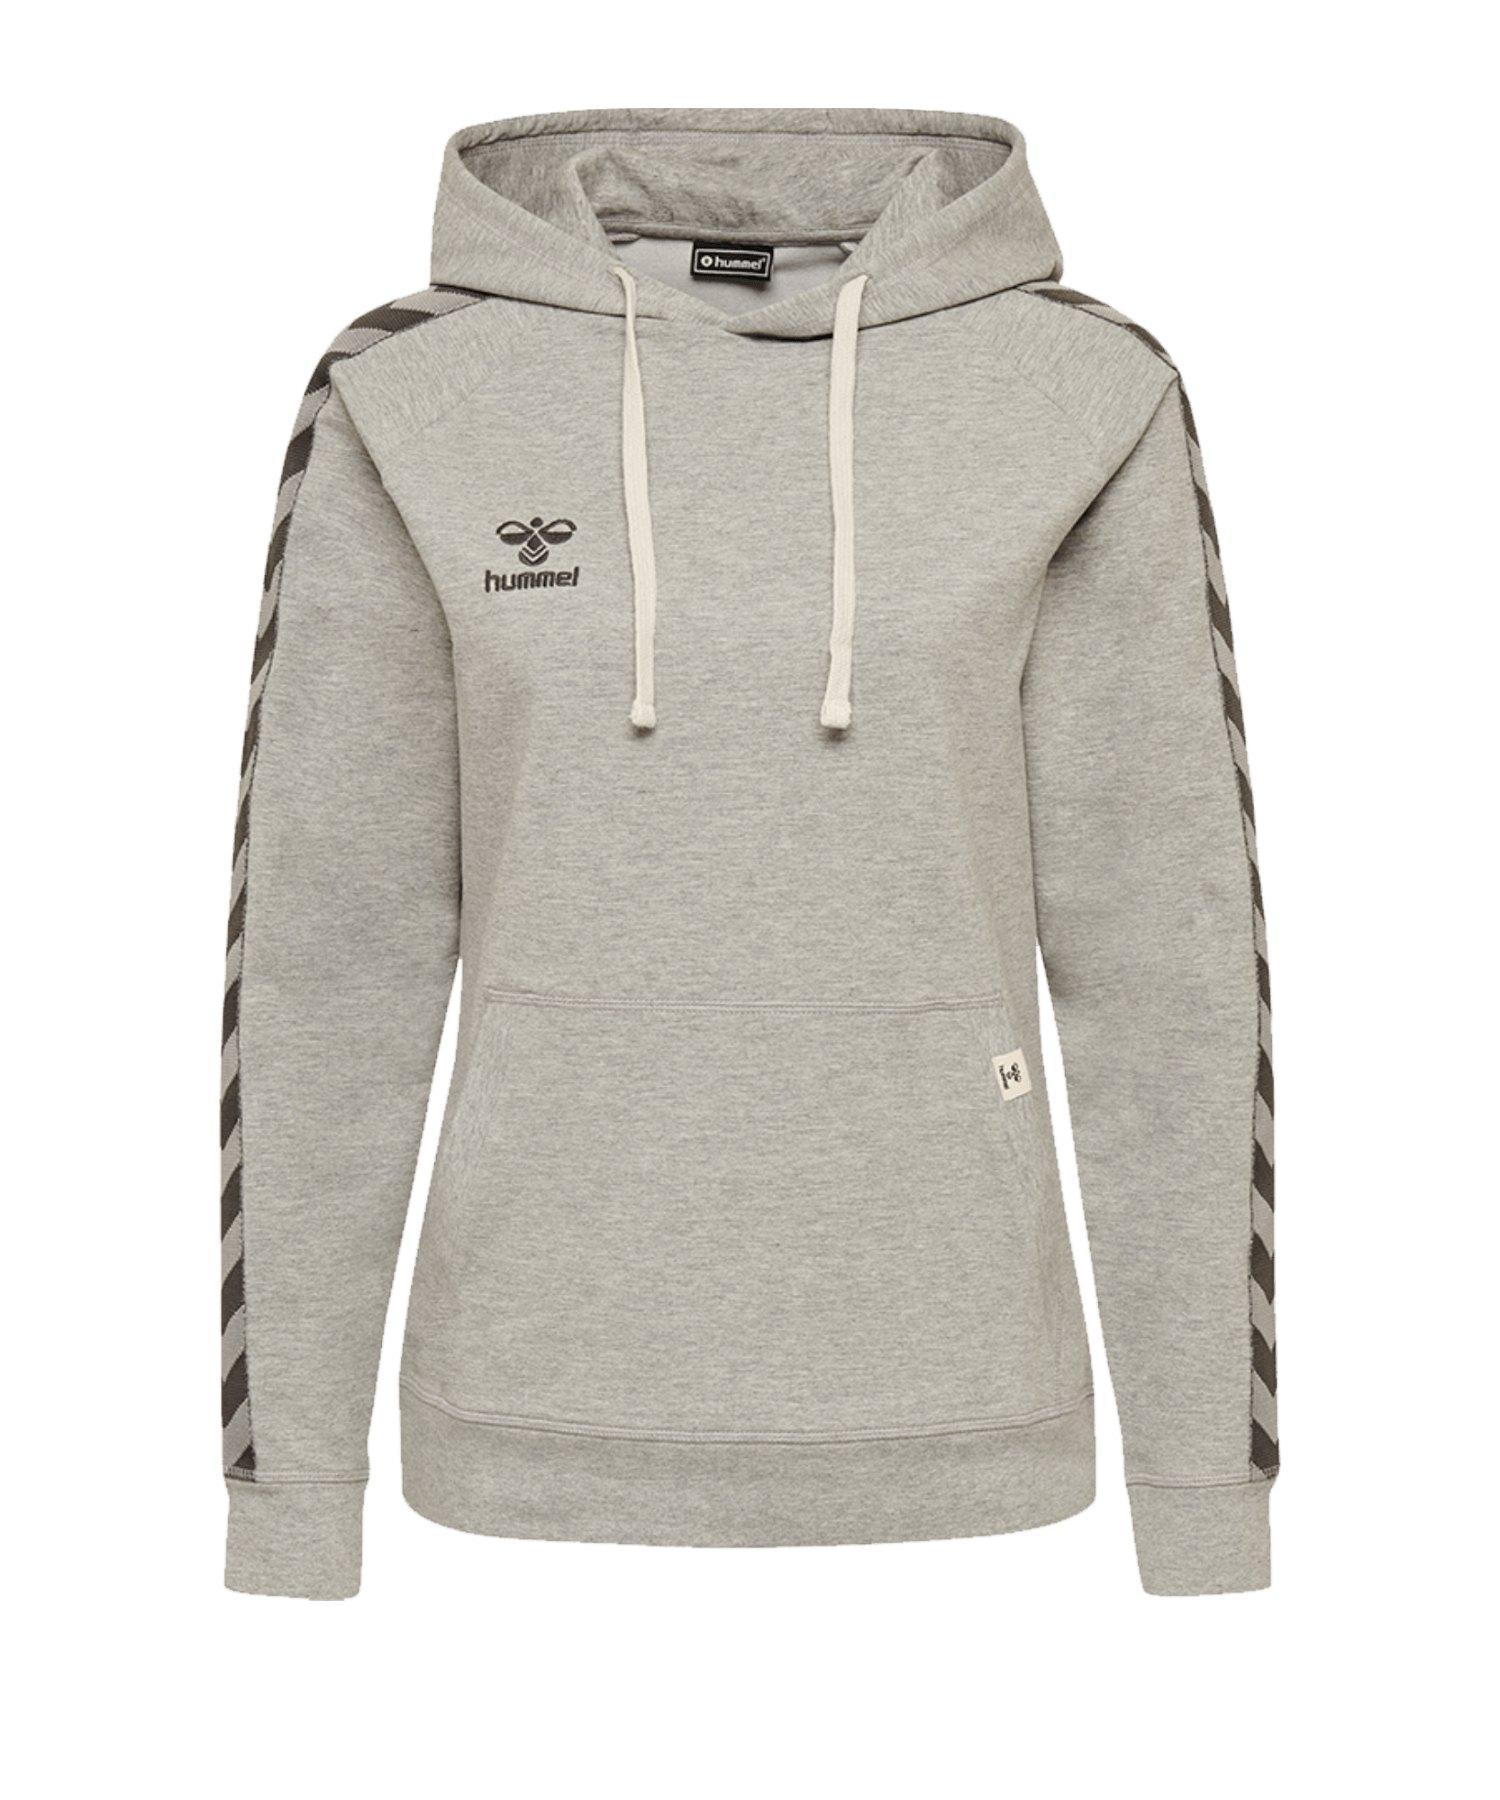 Hummel Move Classic Kapuzensweatshirt Damen F2006 - grau